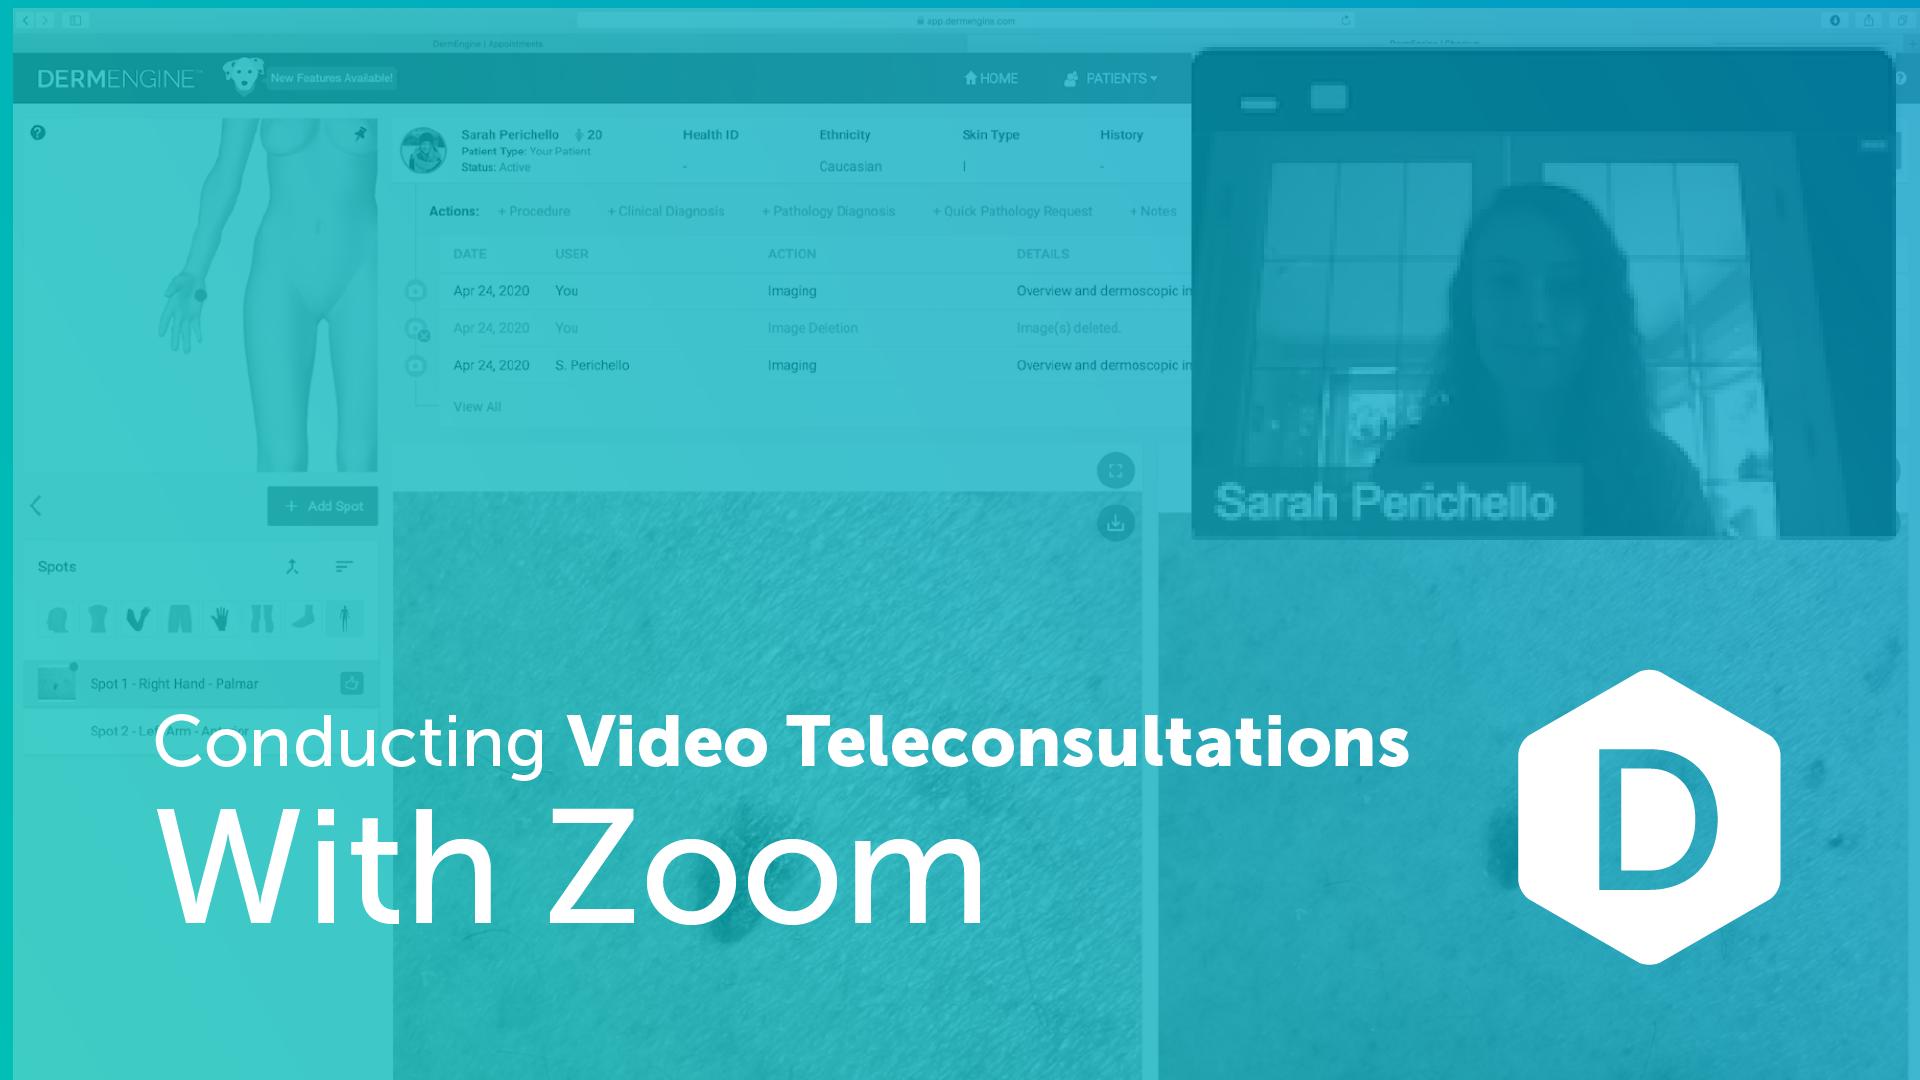 DermEngine Zoom Teledermatology Video Consultation Guide